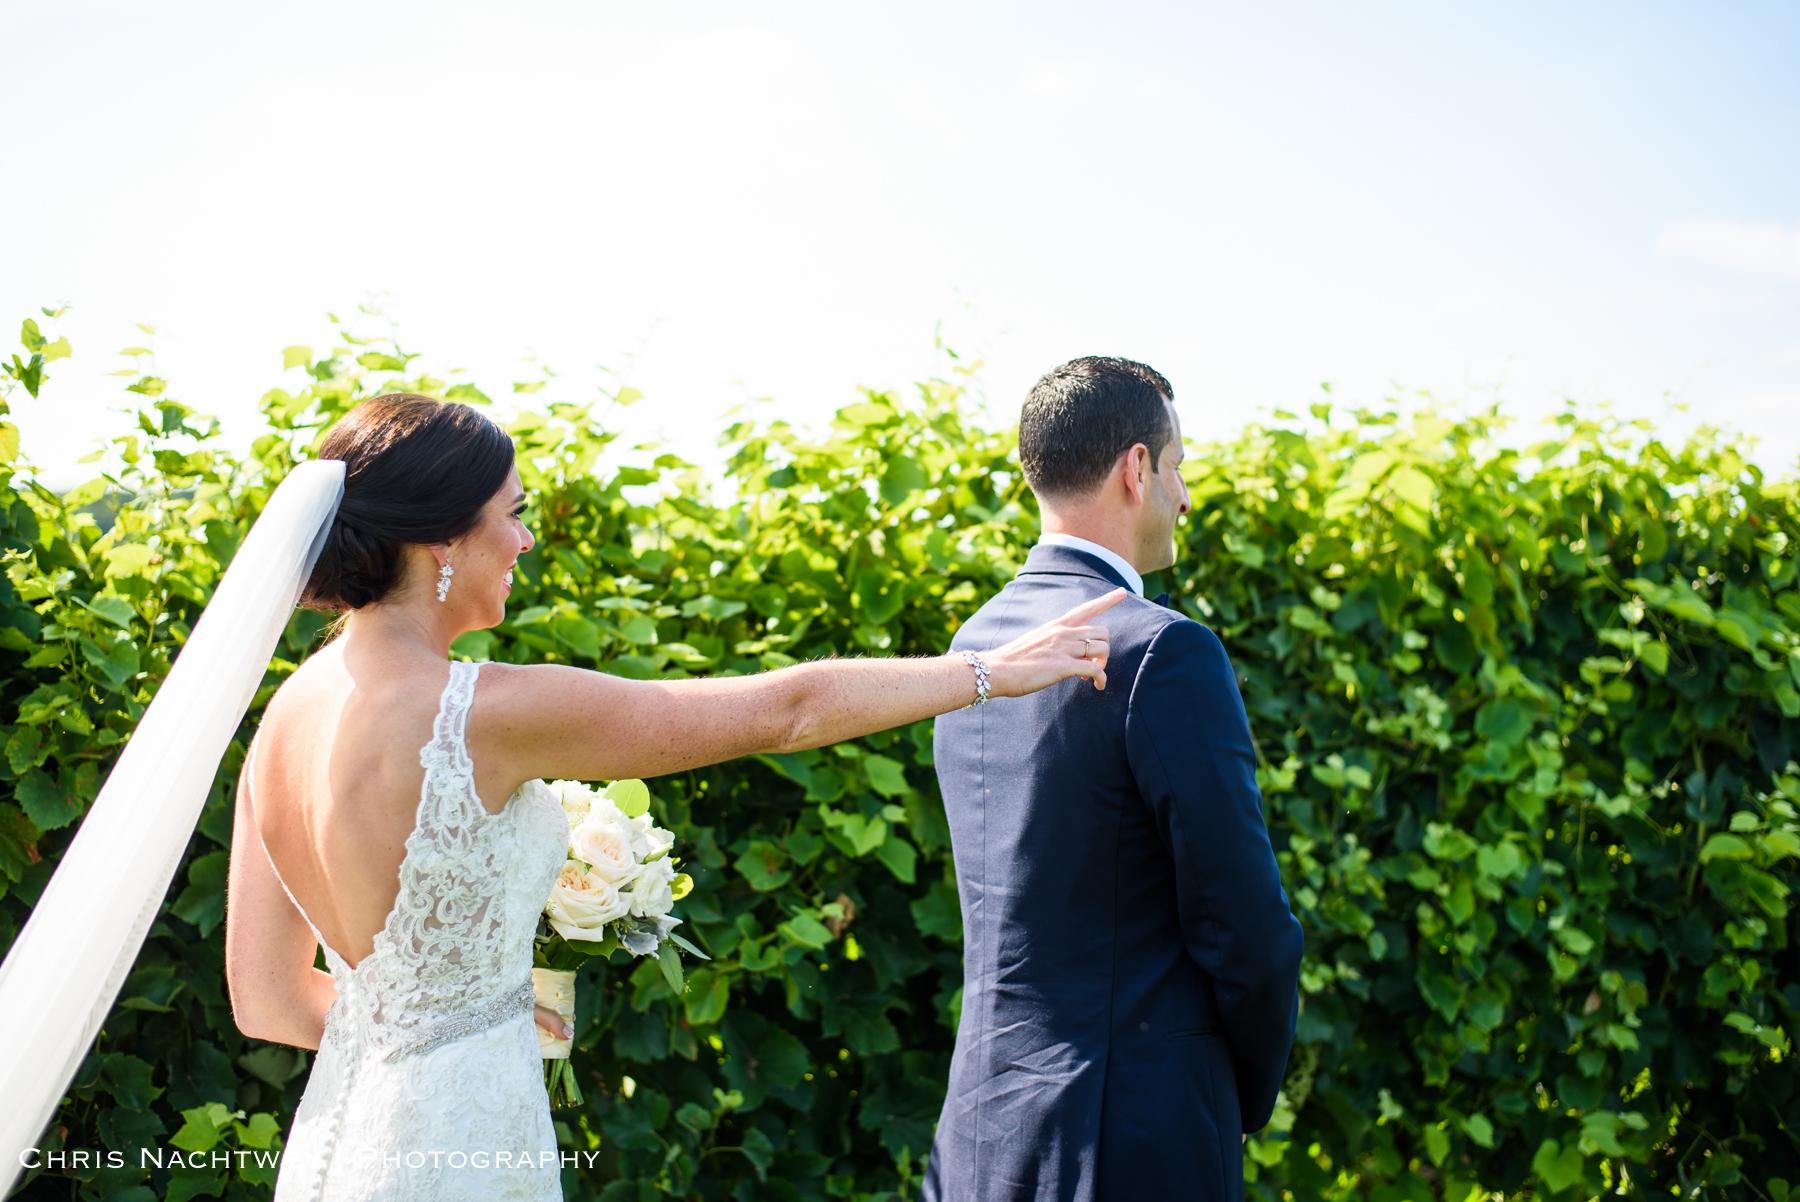 wedding-lake-of-isles-photos-chris-nachtwey-photography-2019-13.jpg